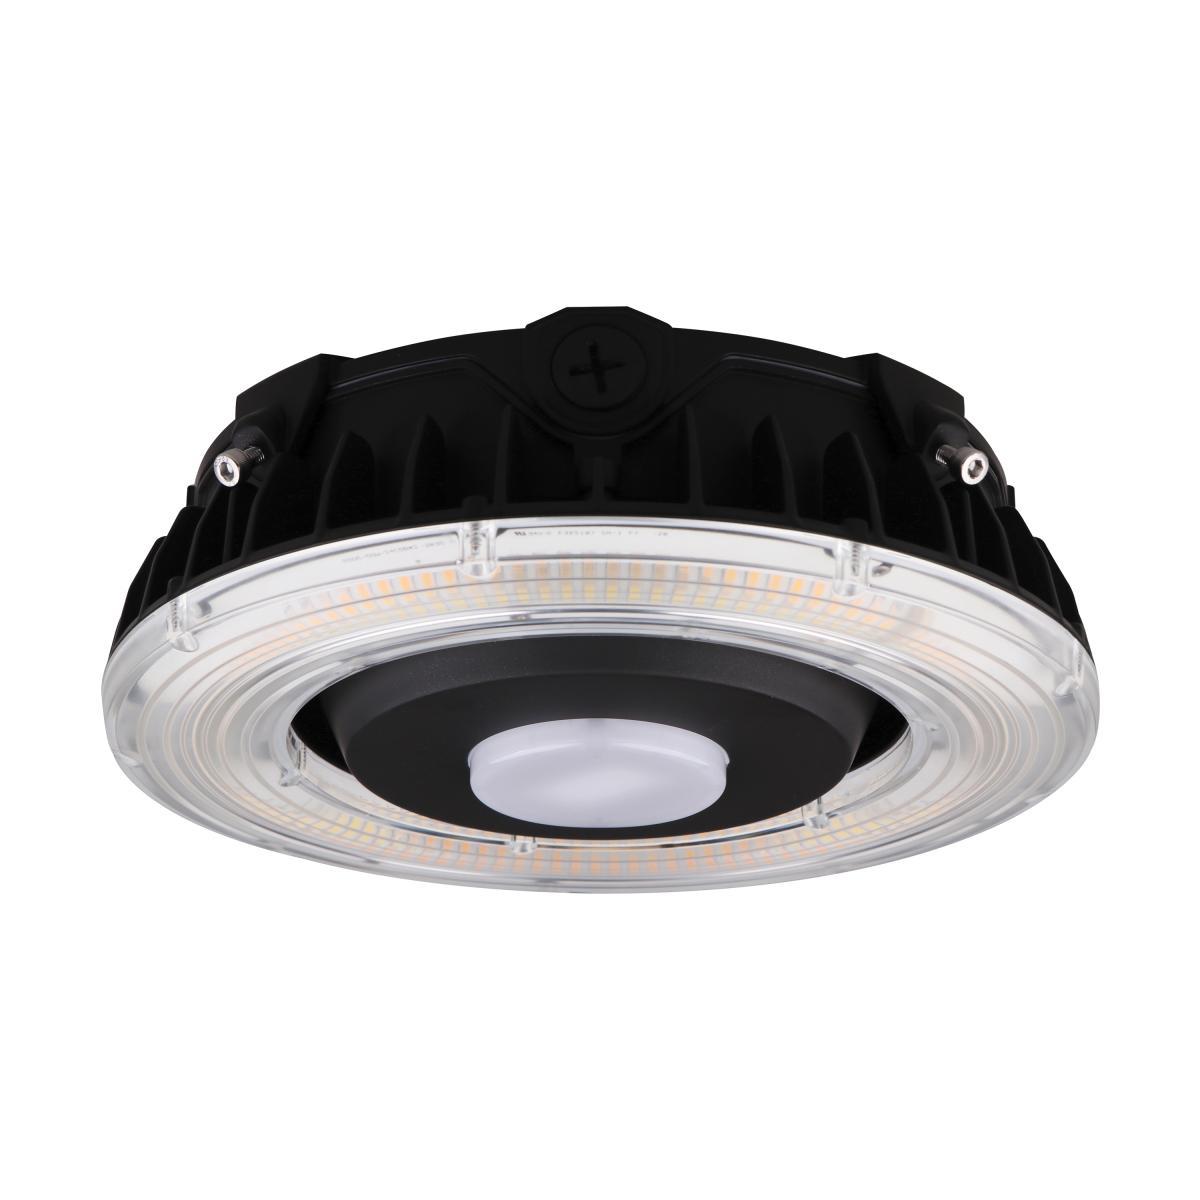 65-624 25W LED CANOPY LIGHT